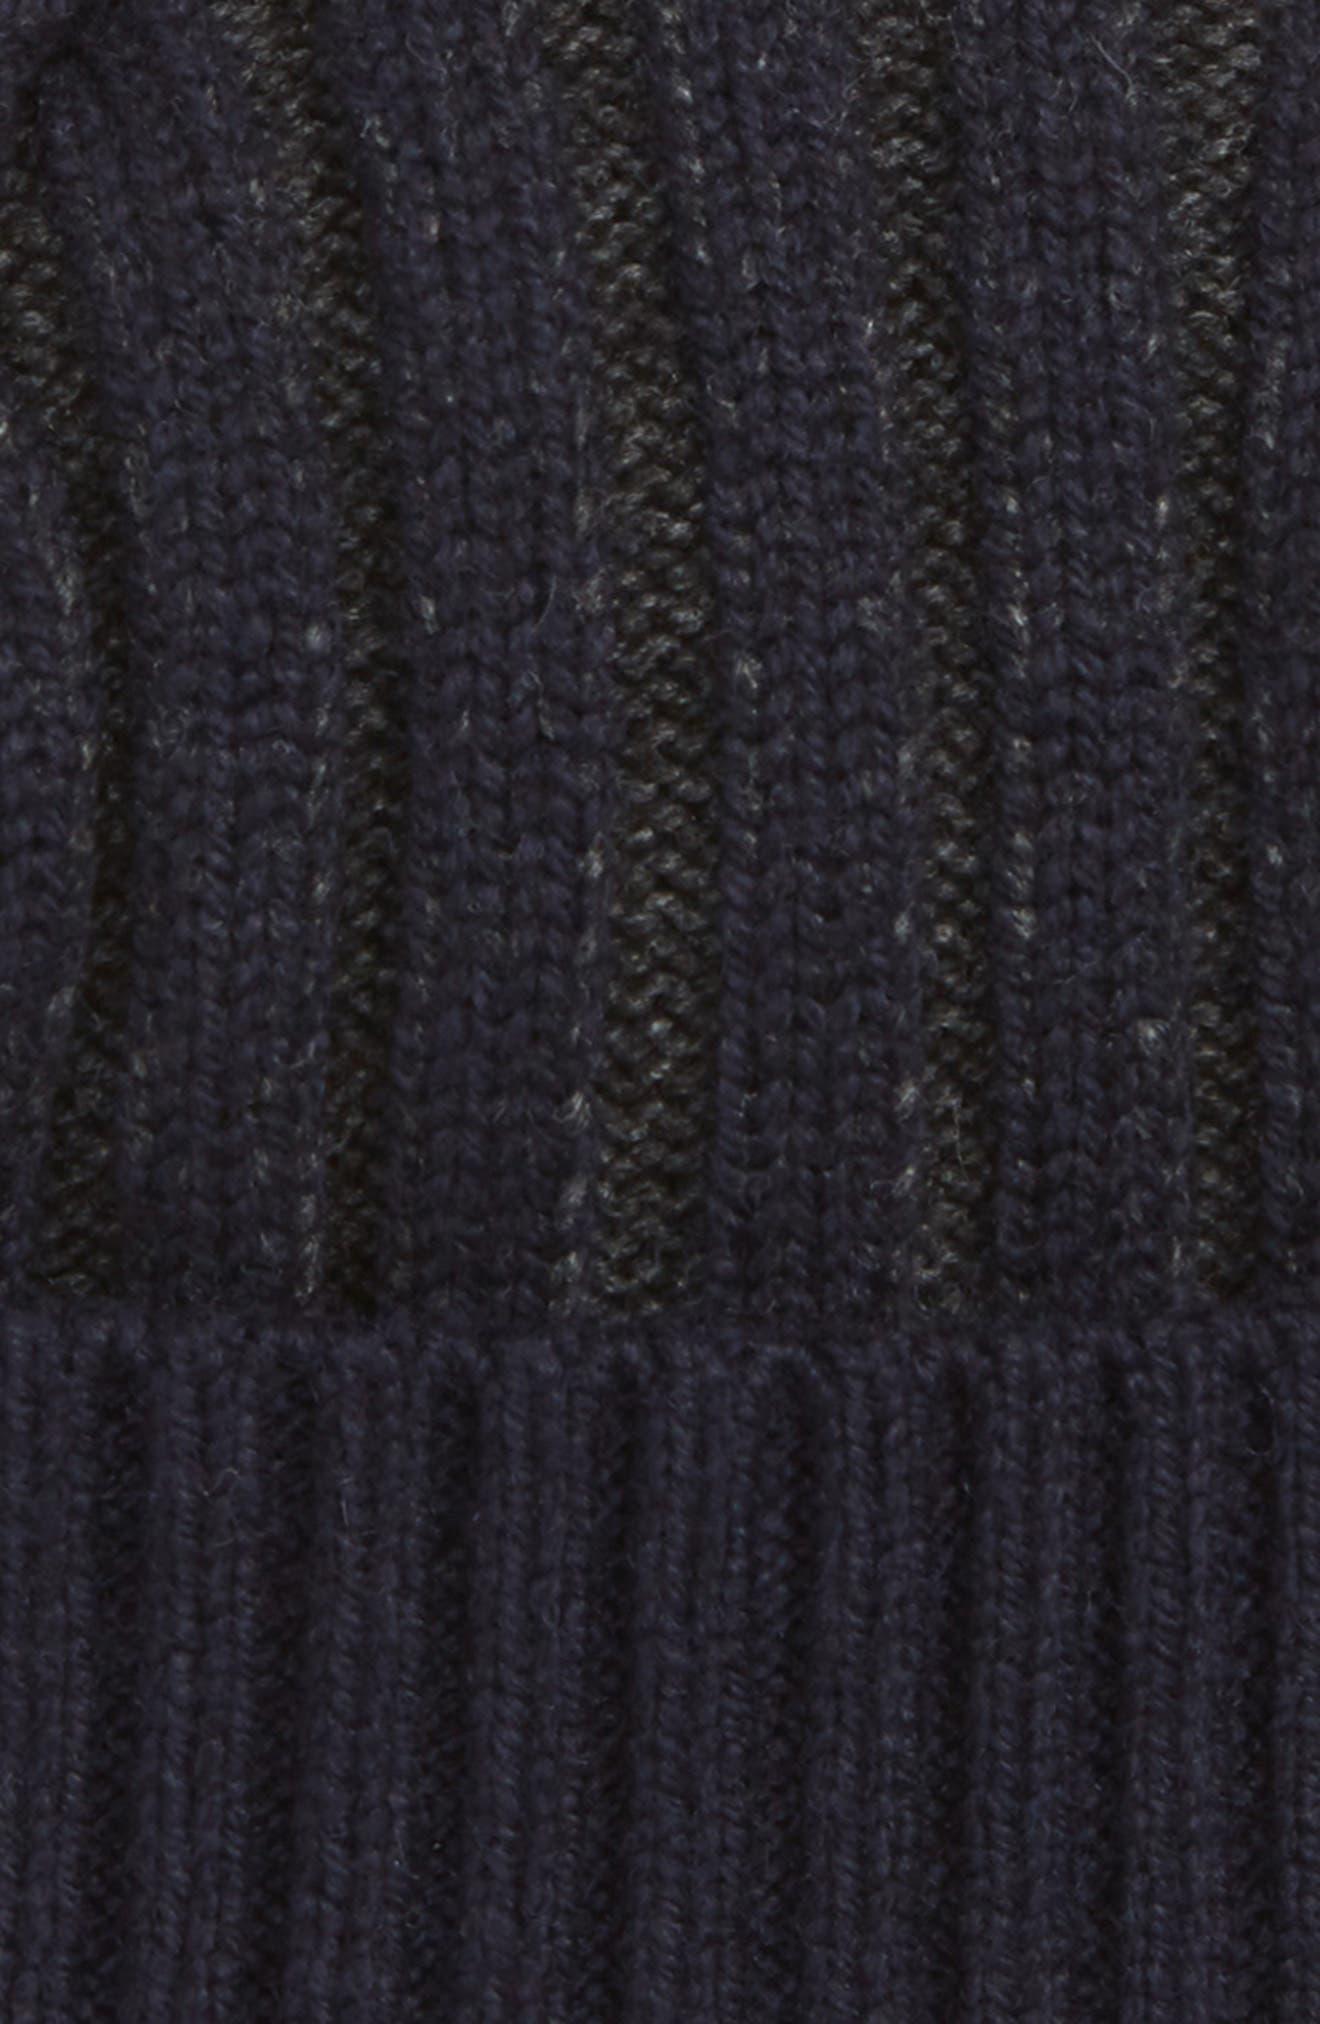 Knitted Interest Hat,                             Alternate thumbnail 2, color,                             410